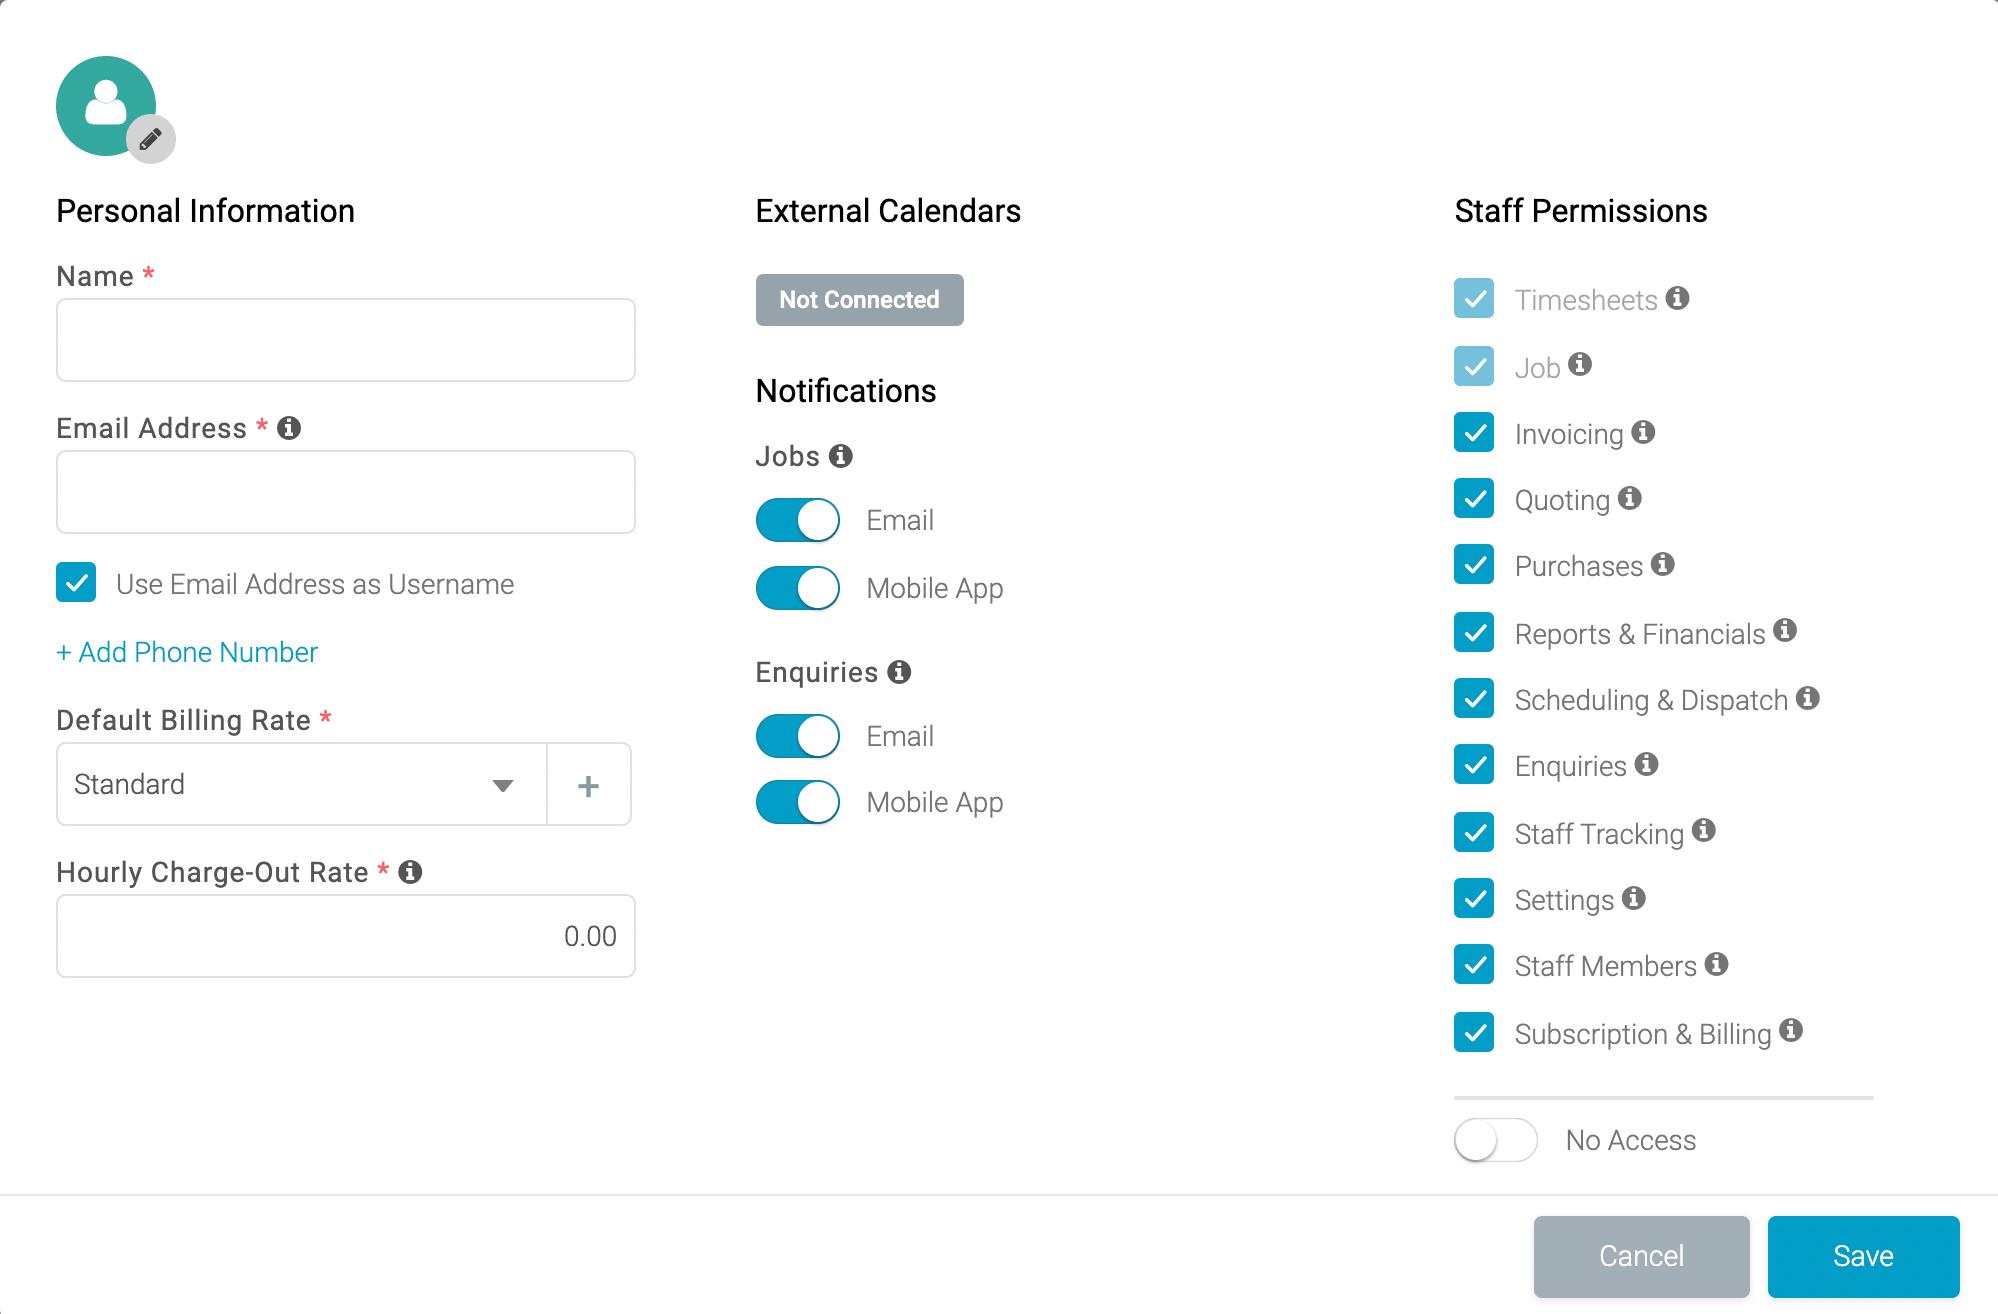 Creating an Admin Account on the Tradify Web App